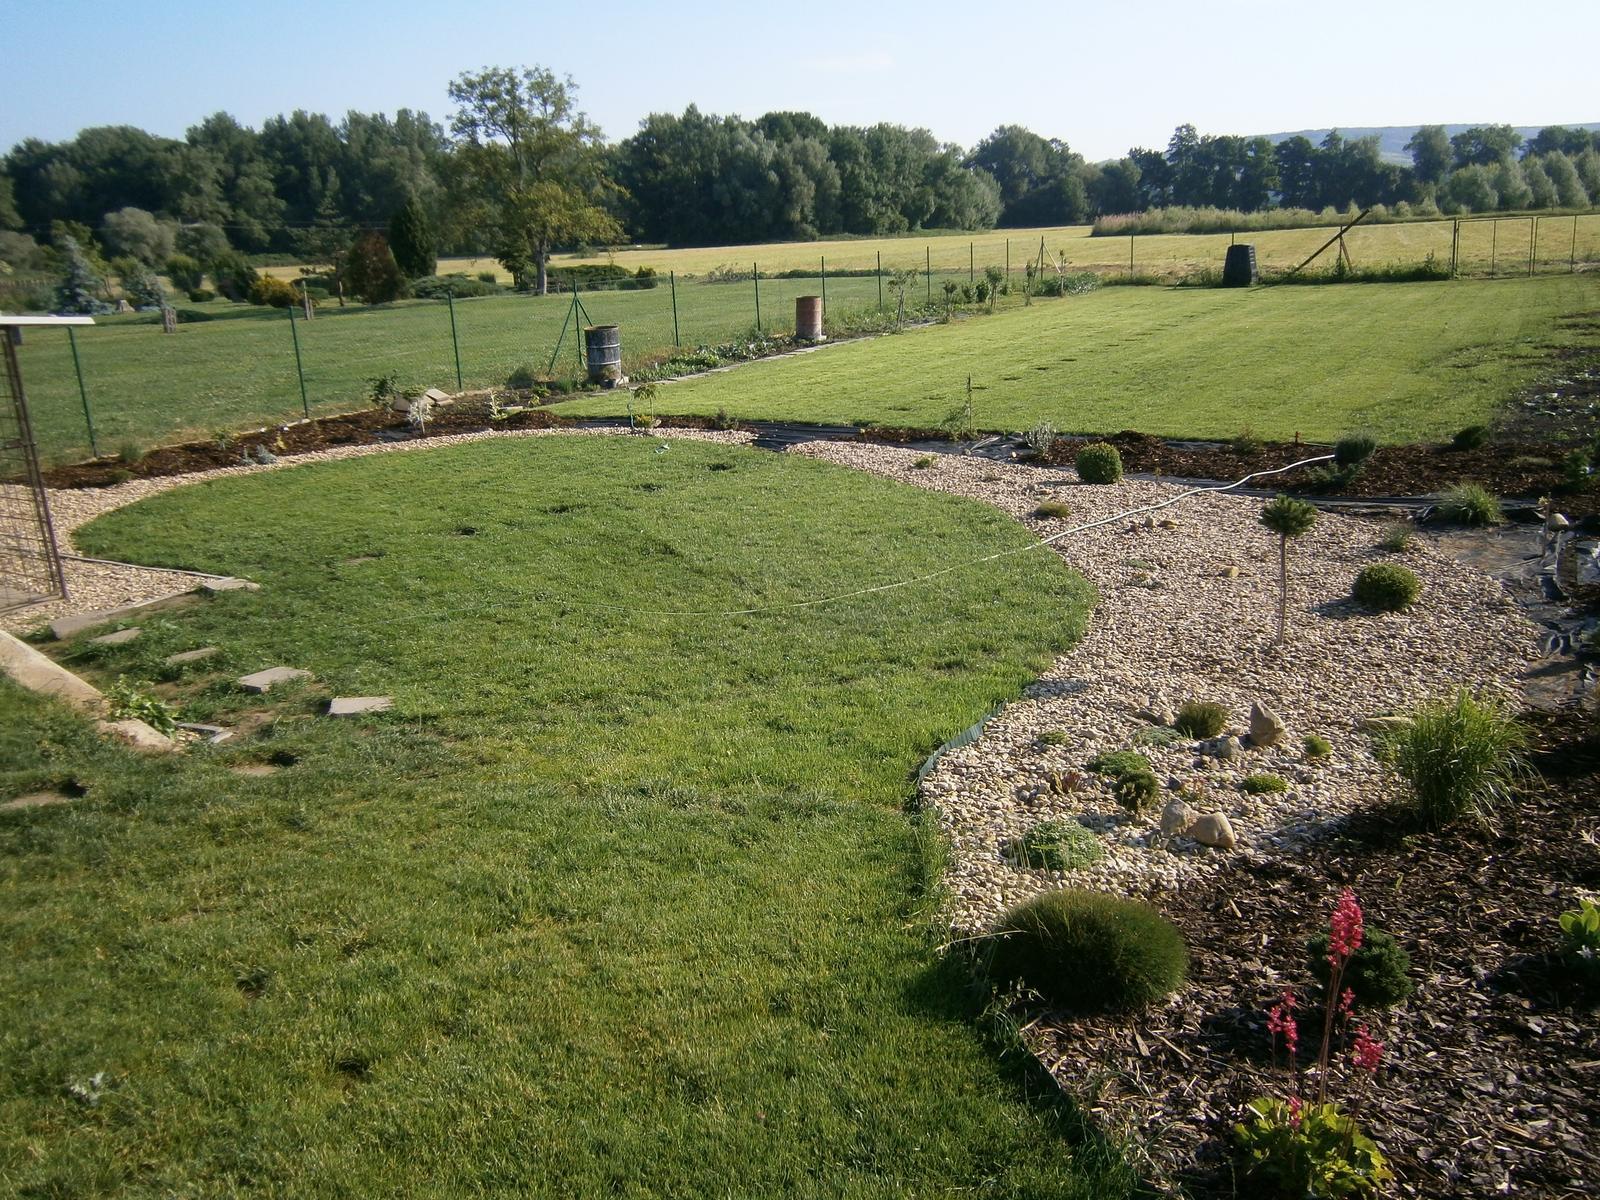 Zahrada a předzahrádka - okrasný záhon odděluje ,užitkovou část od okrasné